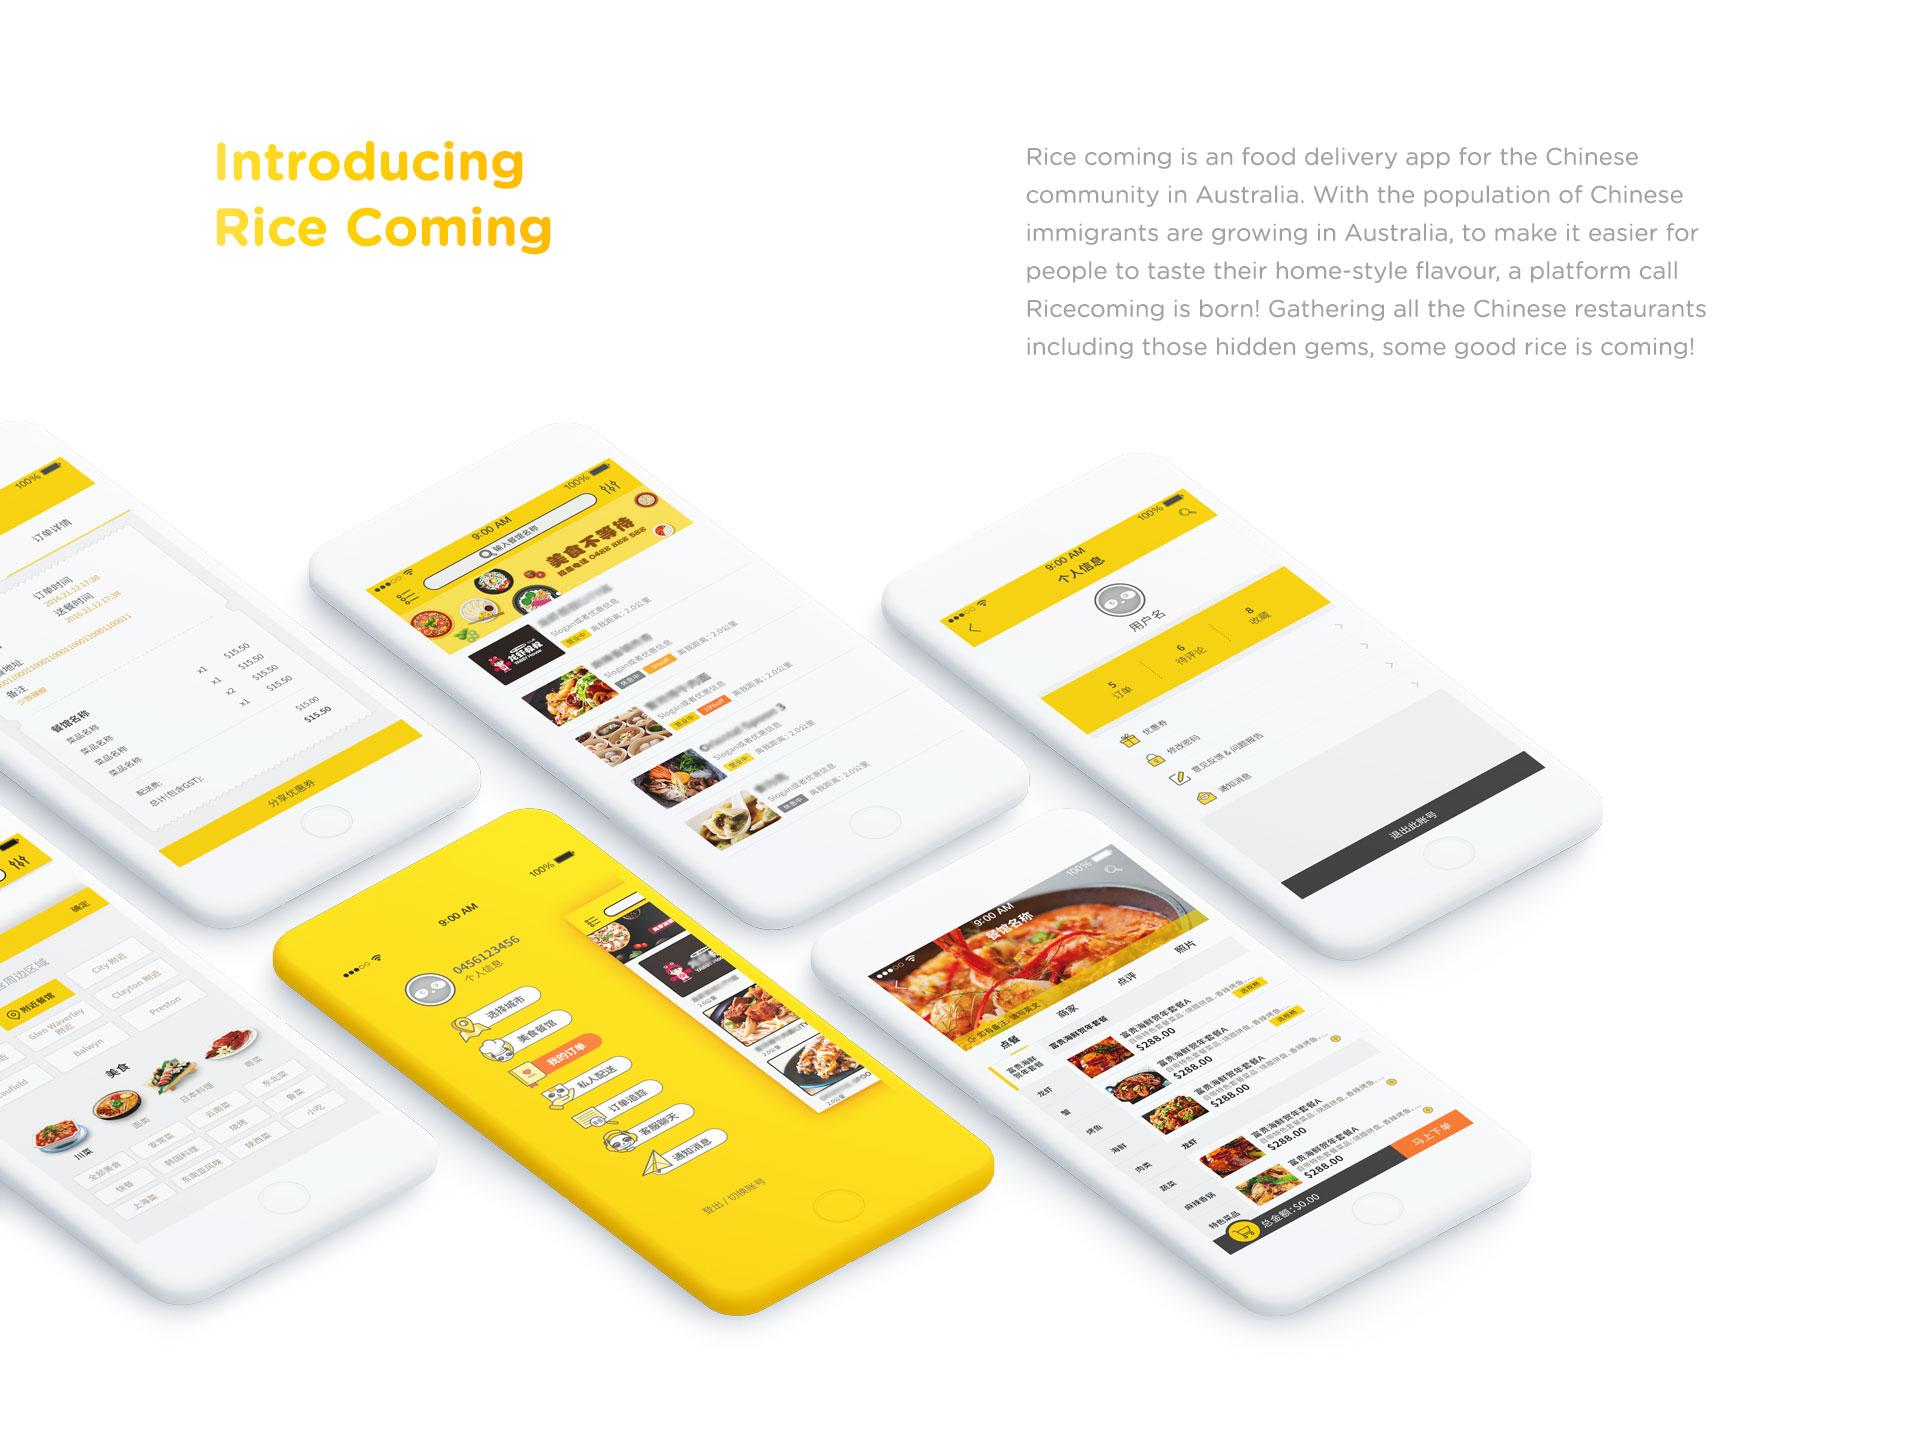 App design by Z Creative Studio Branding & Graphic Design Melbourne